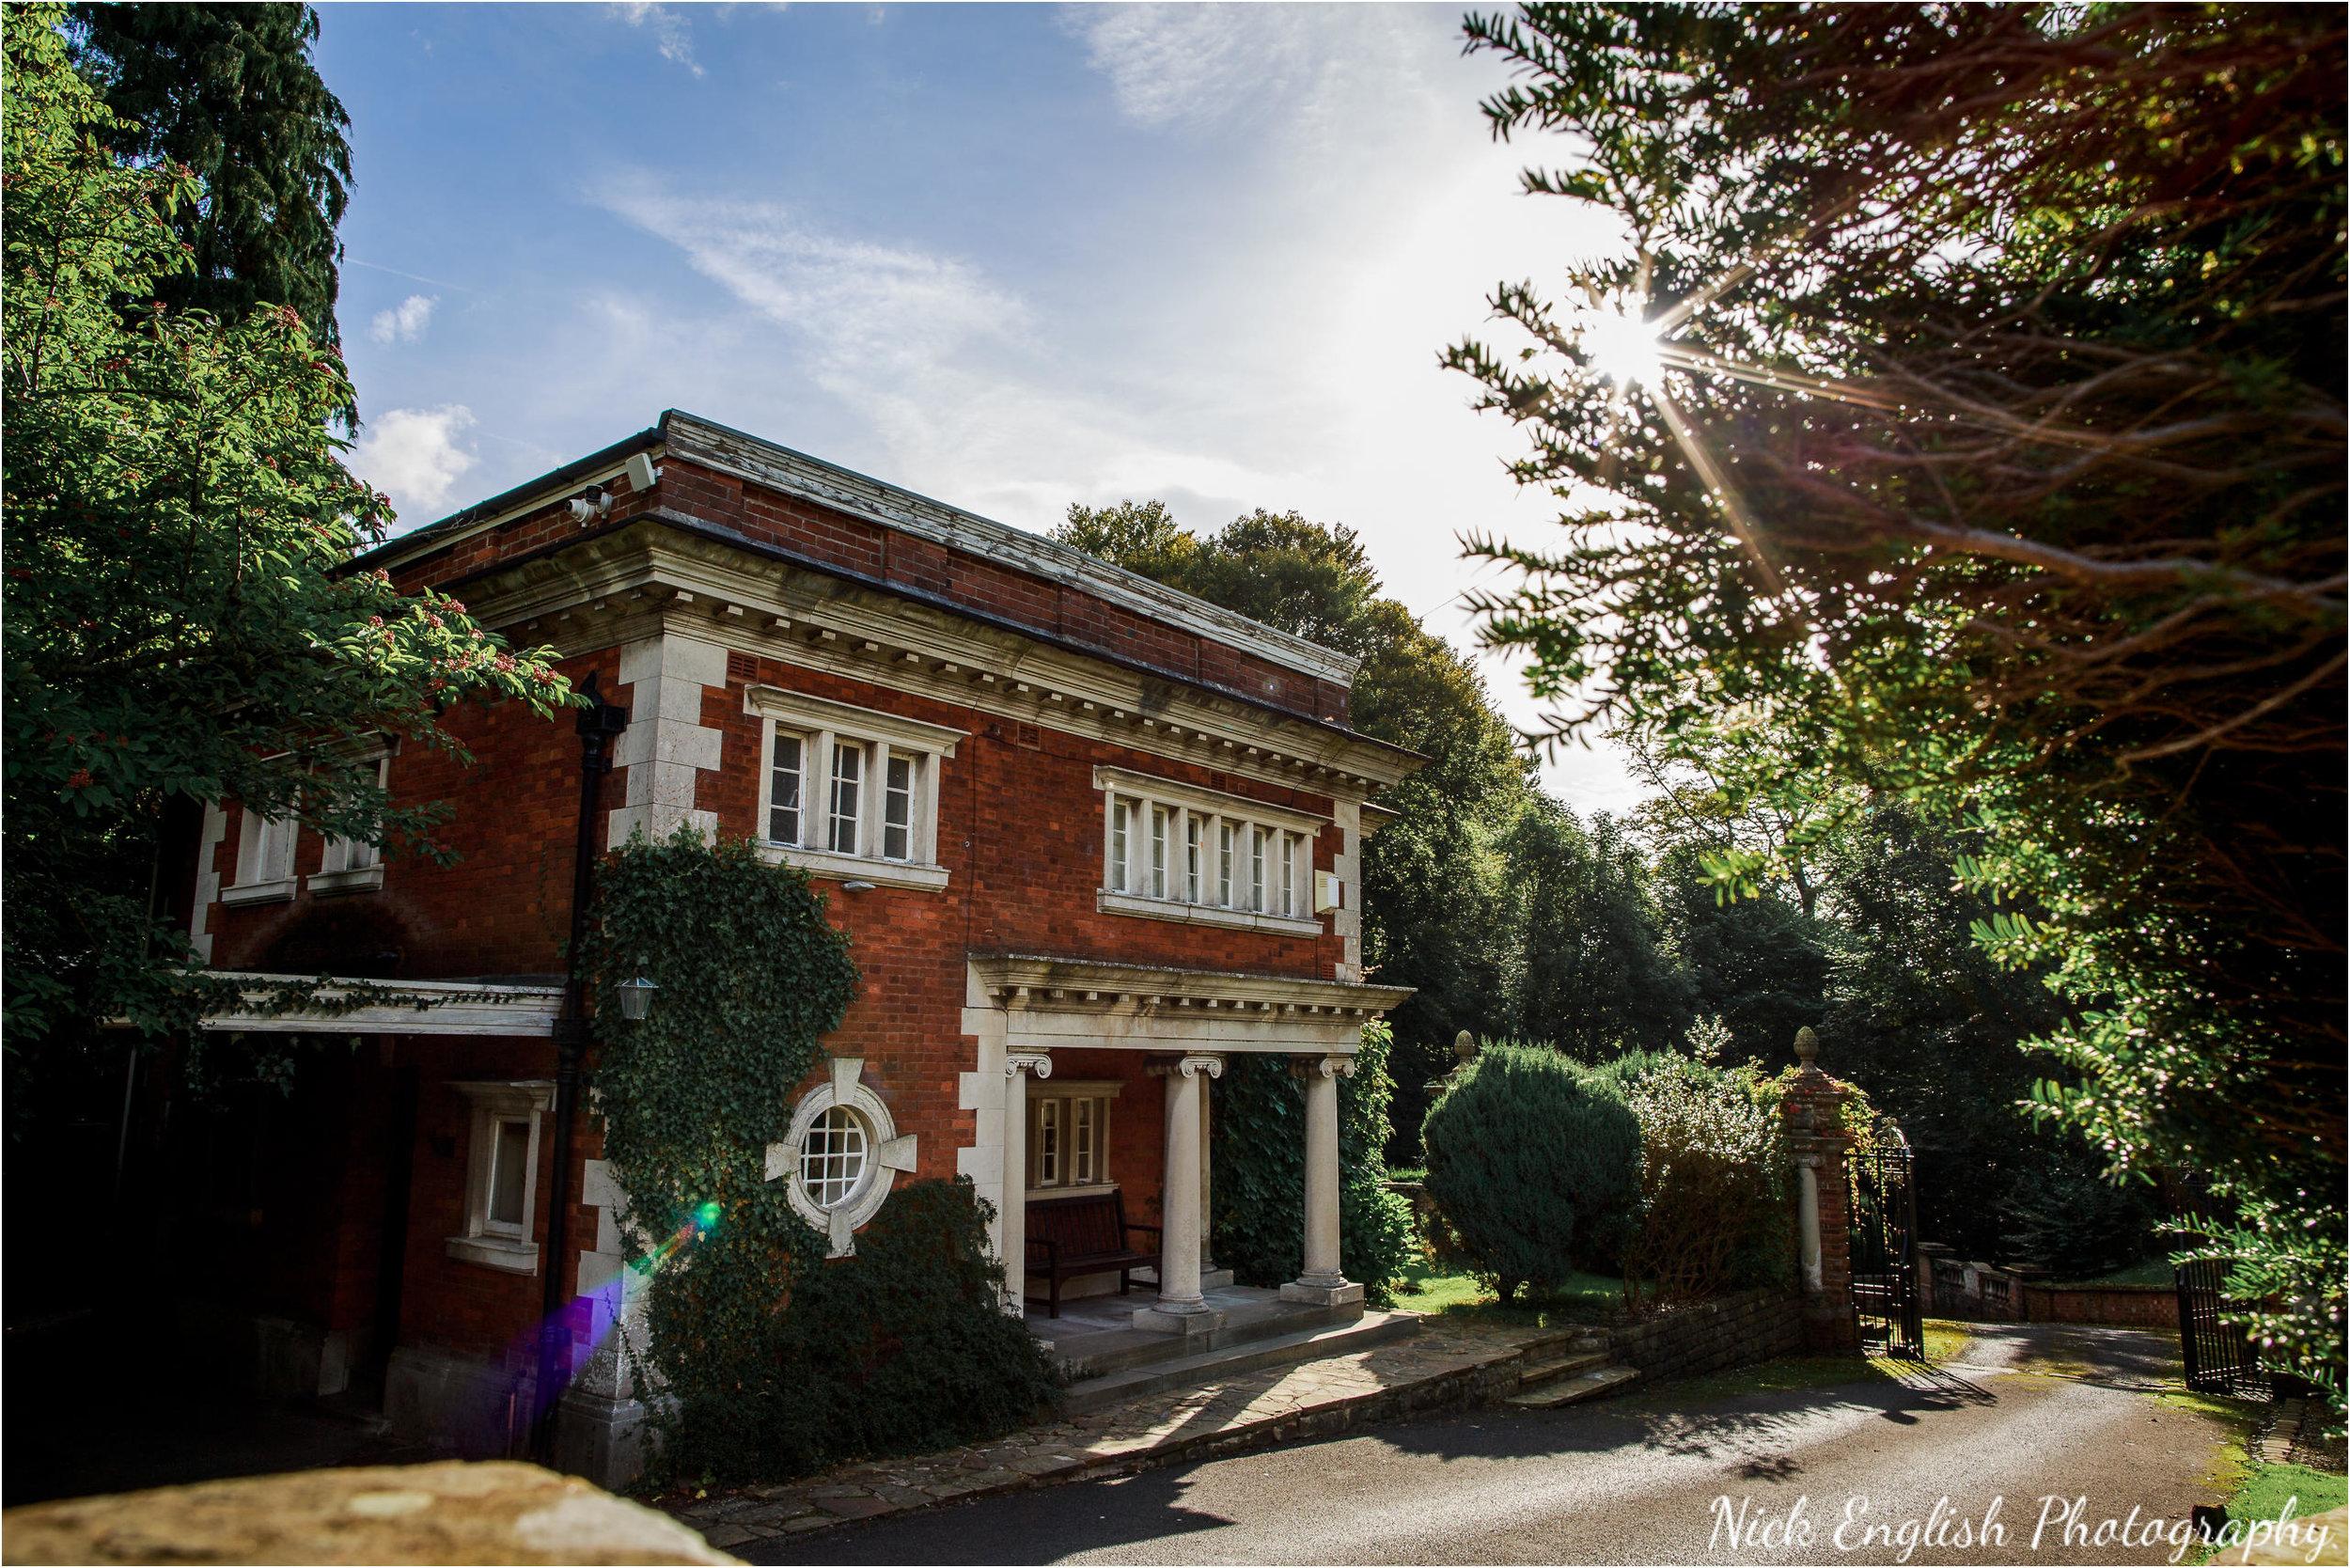 The Lodge, Eaves Hall